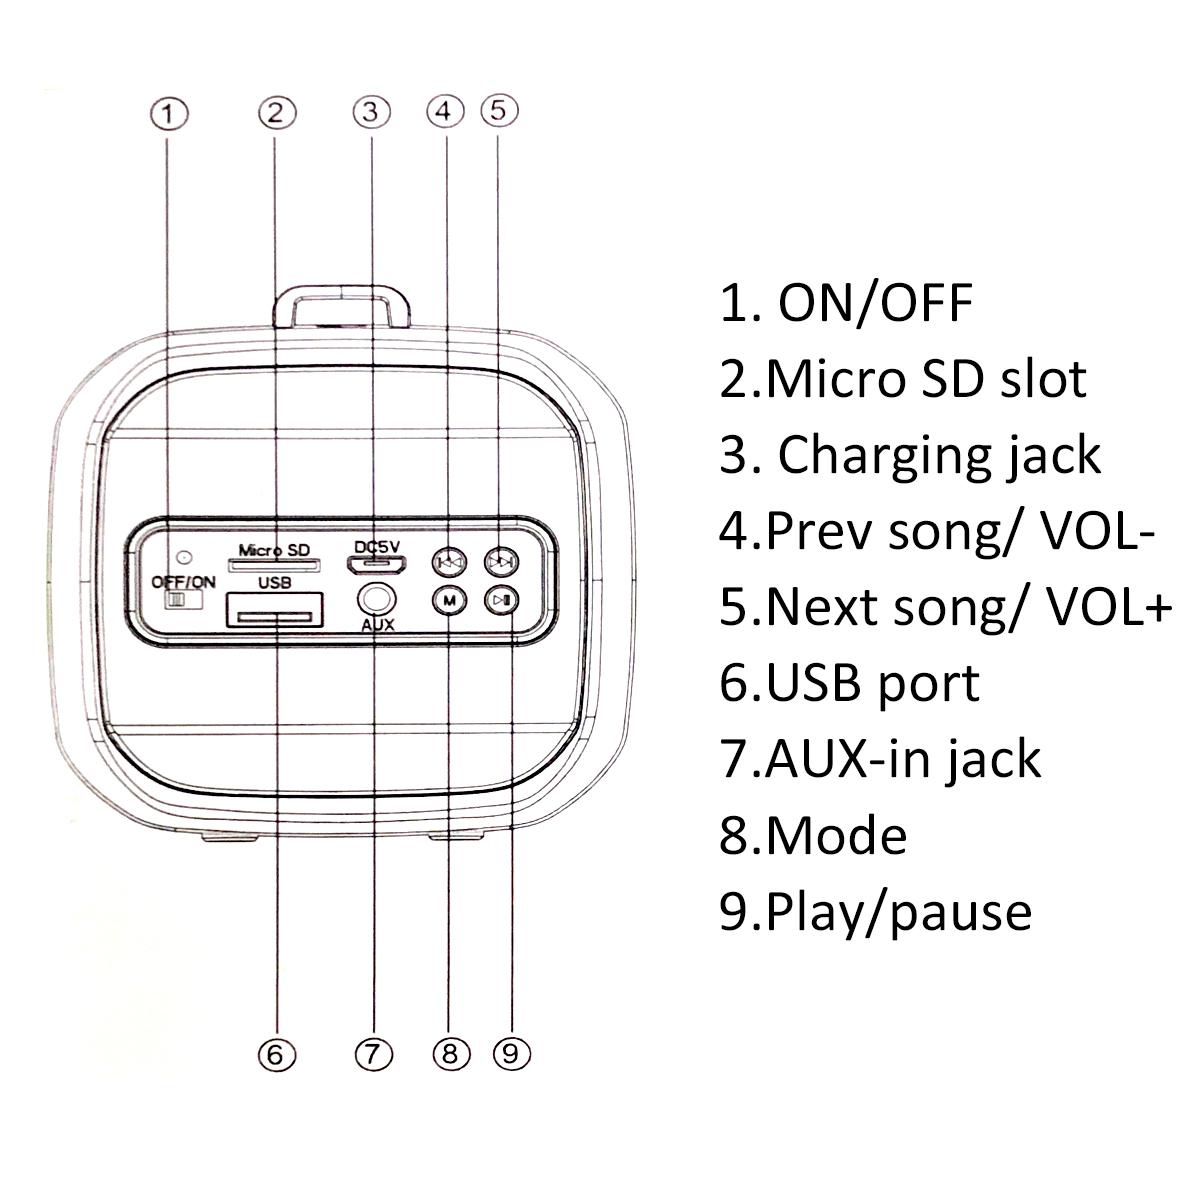 Cigii Dc 5v Portable Wireless Bluetooth Speaker Stereo